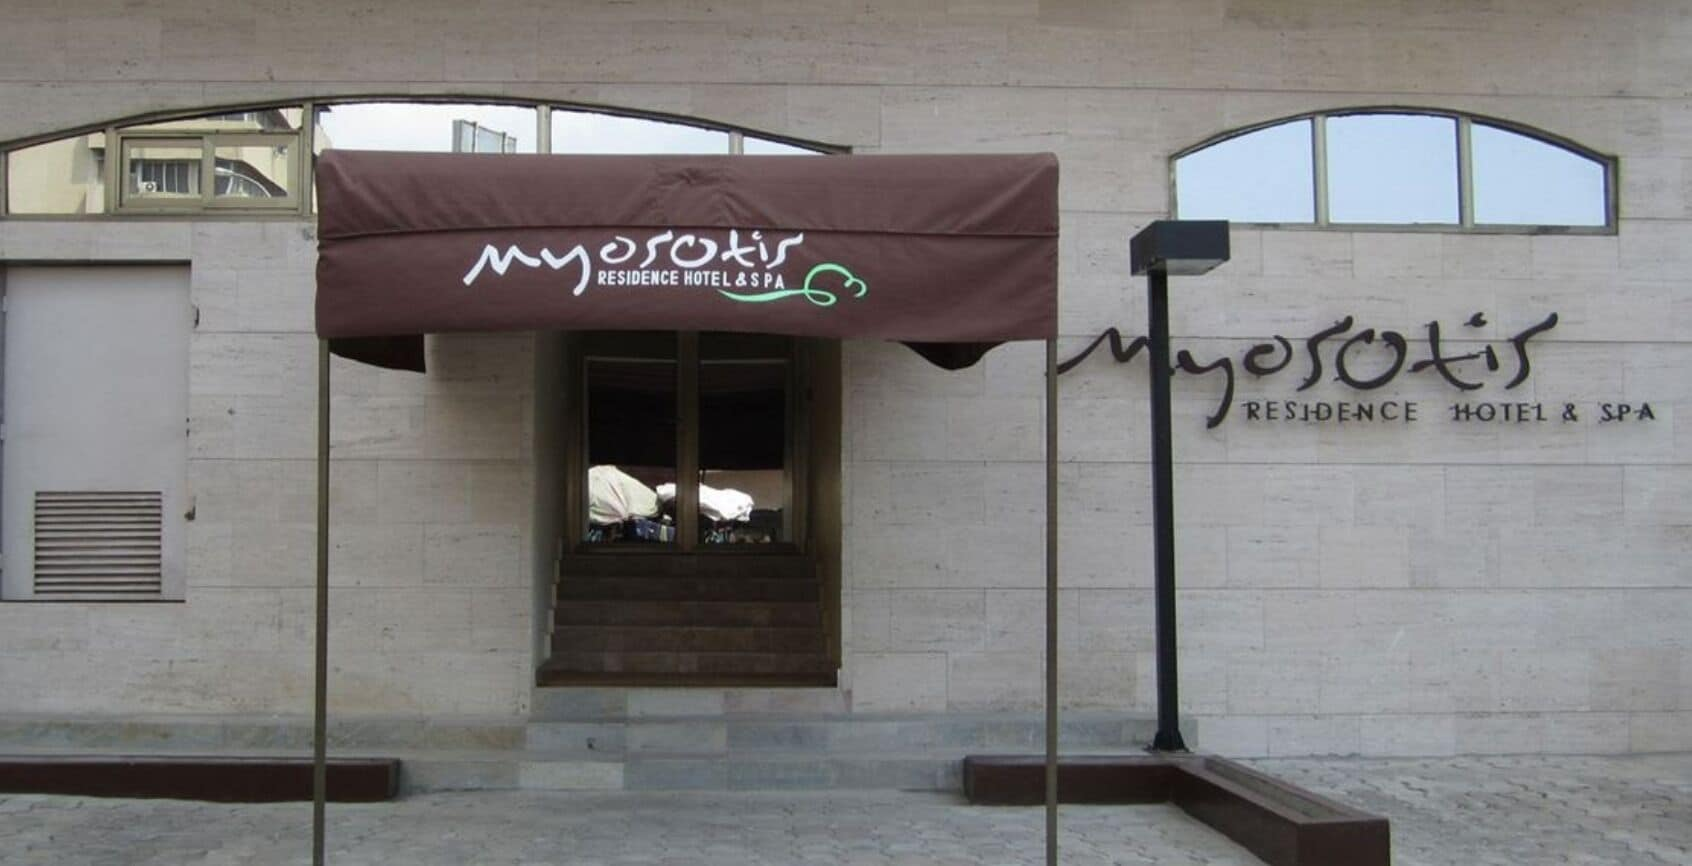 Myosotis Residence Hotel & Spa, Cotonou